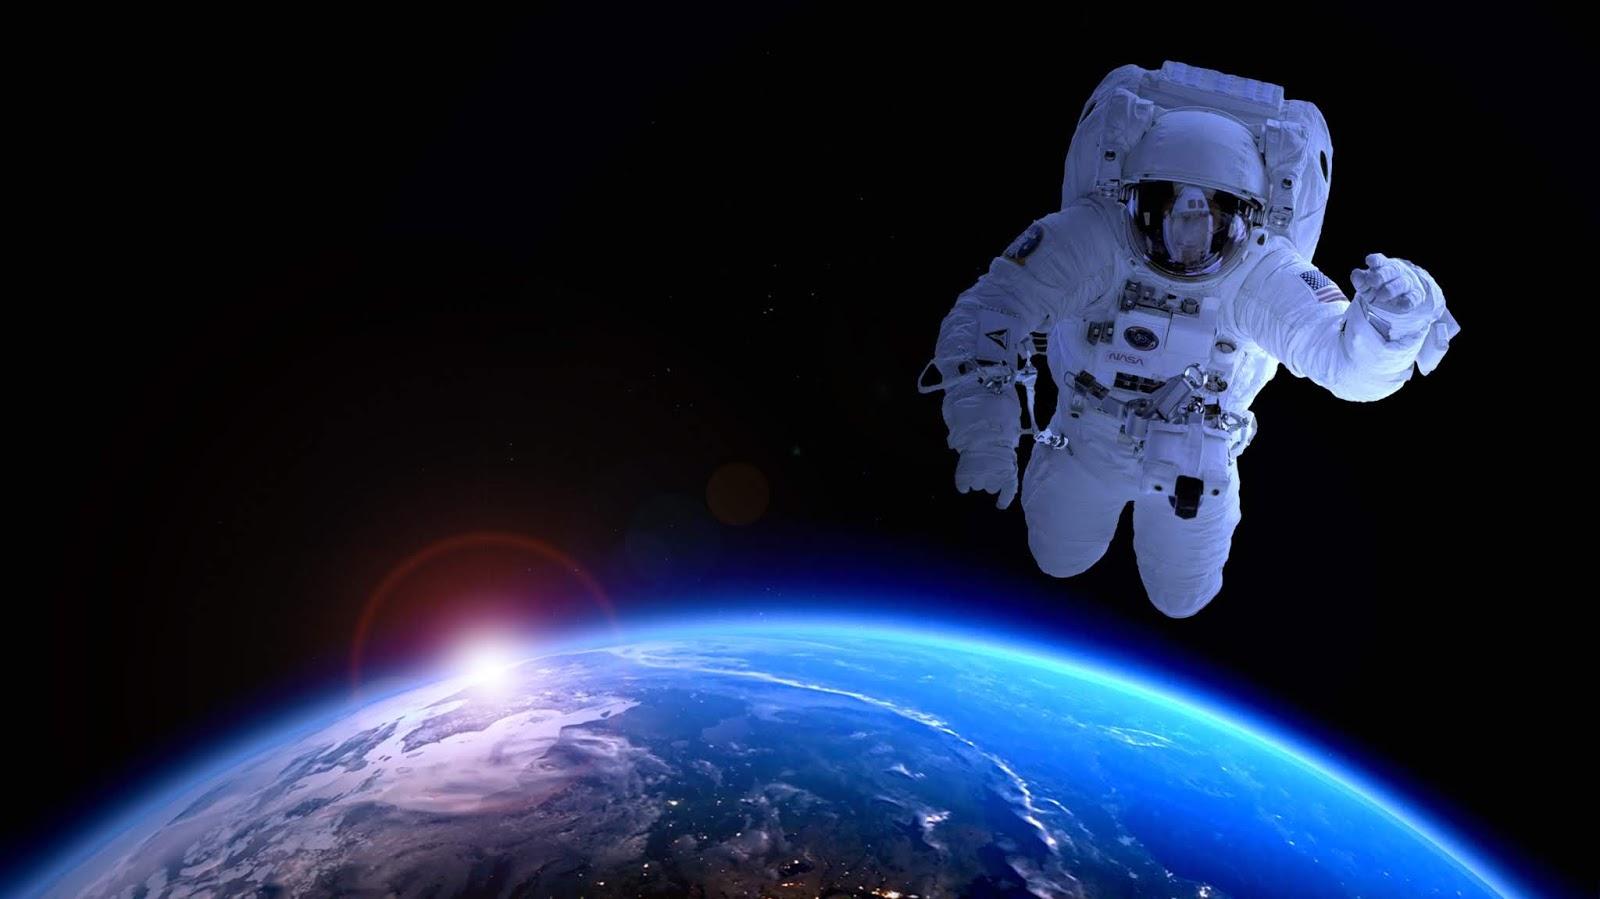 Astronaut, Earth, Dark, Sunrise, Blue, HD, Space